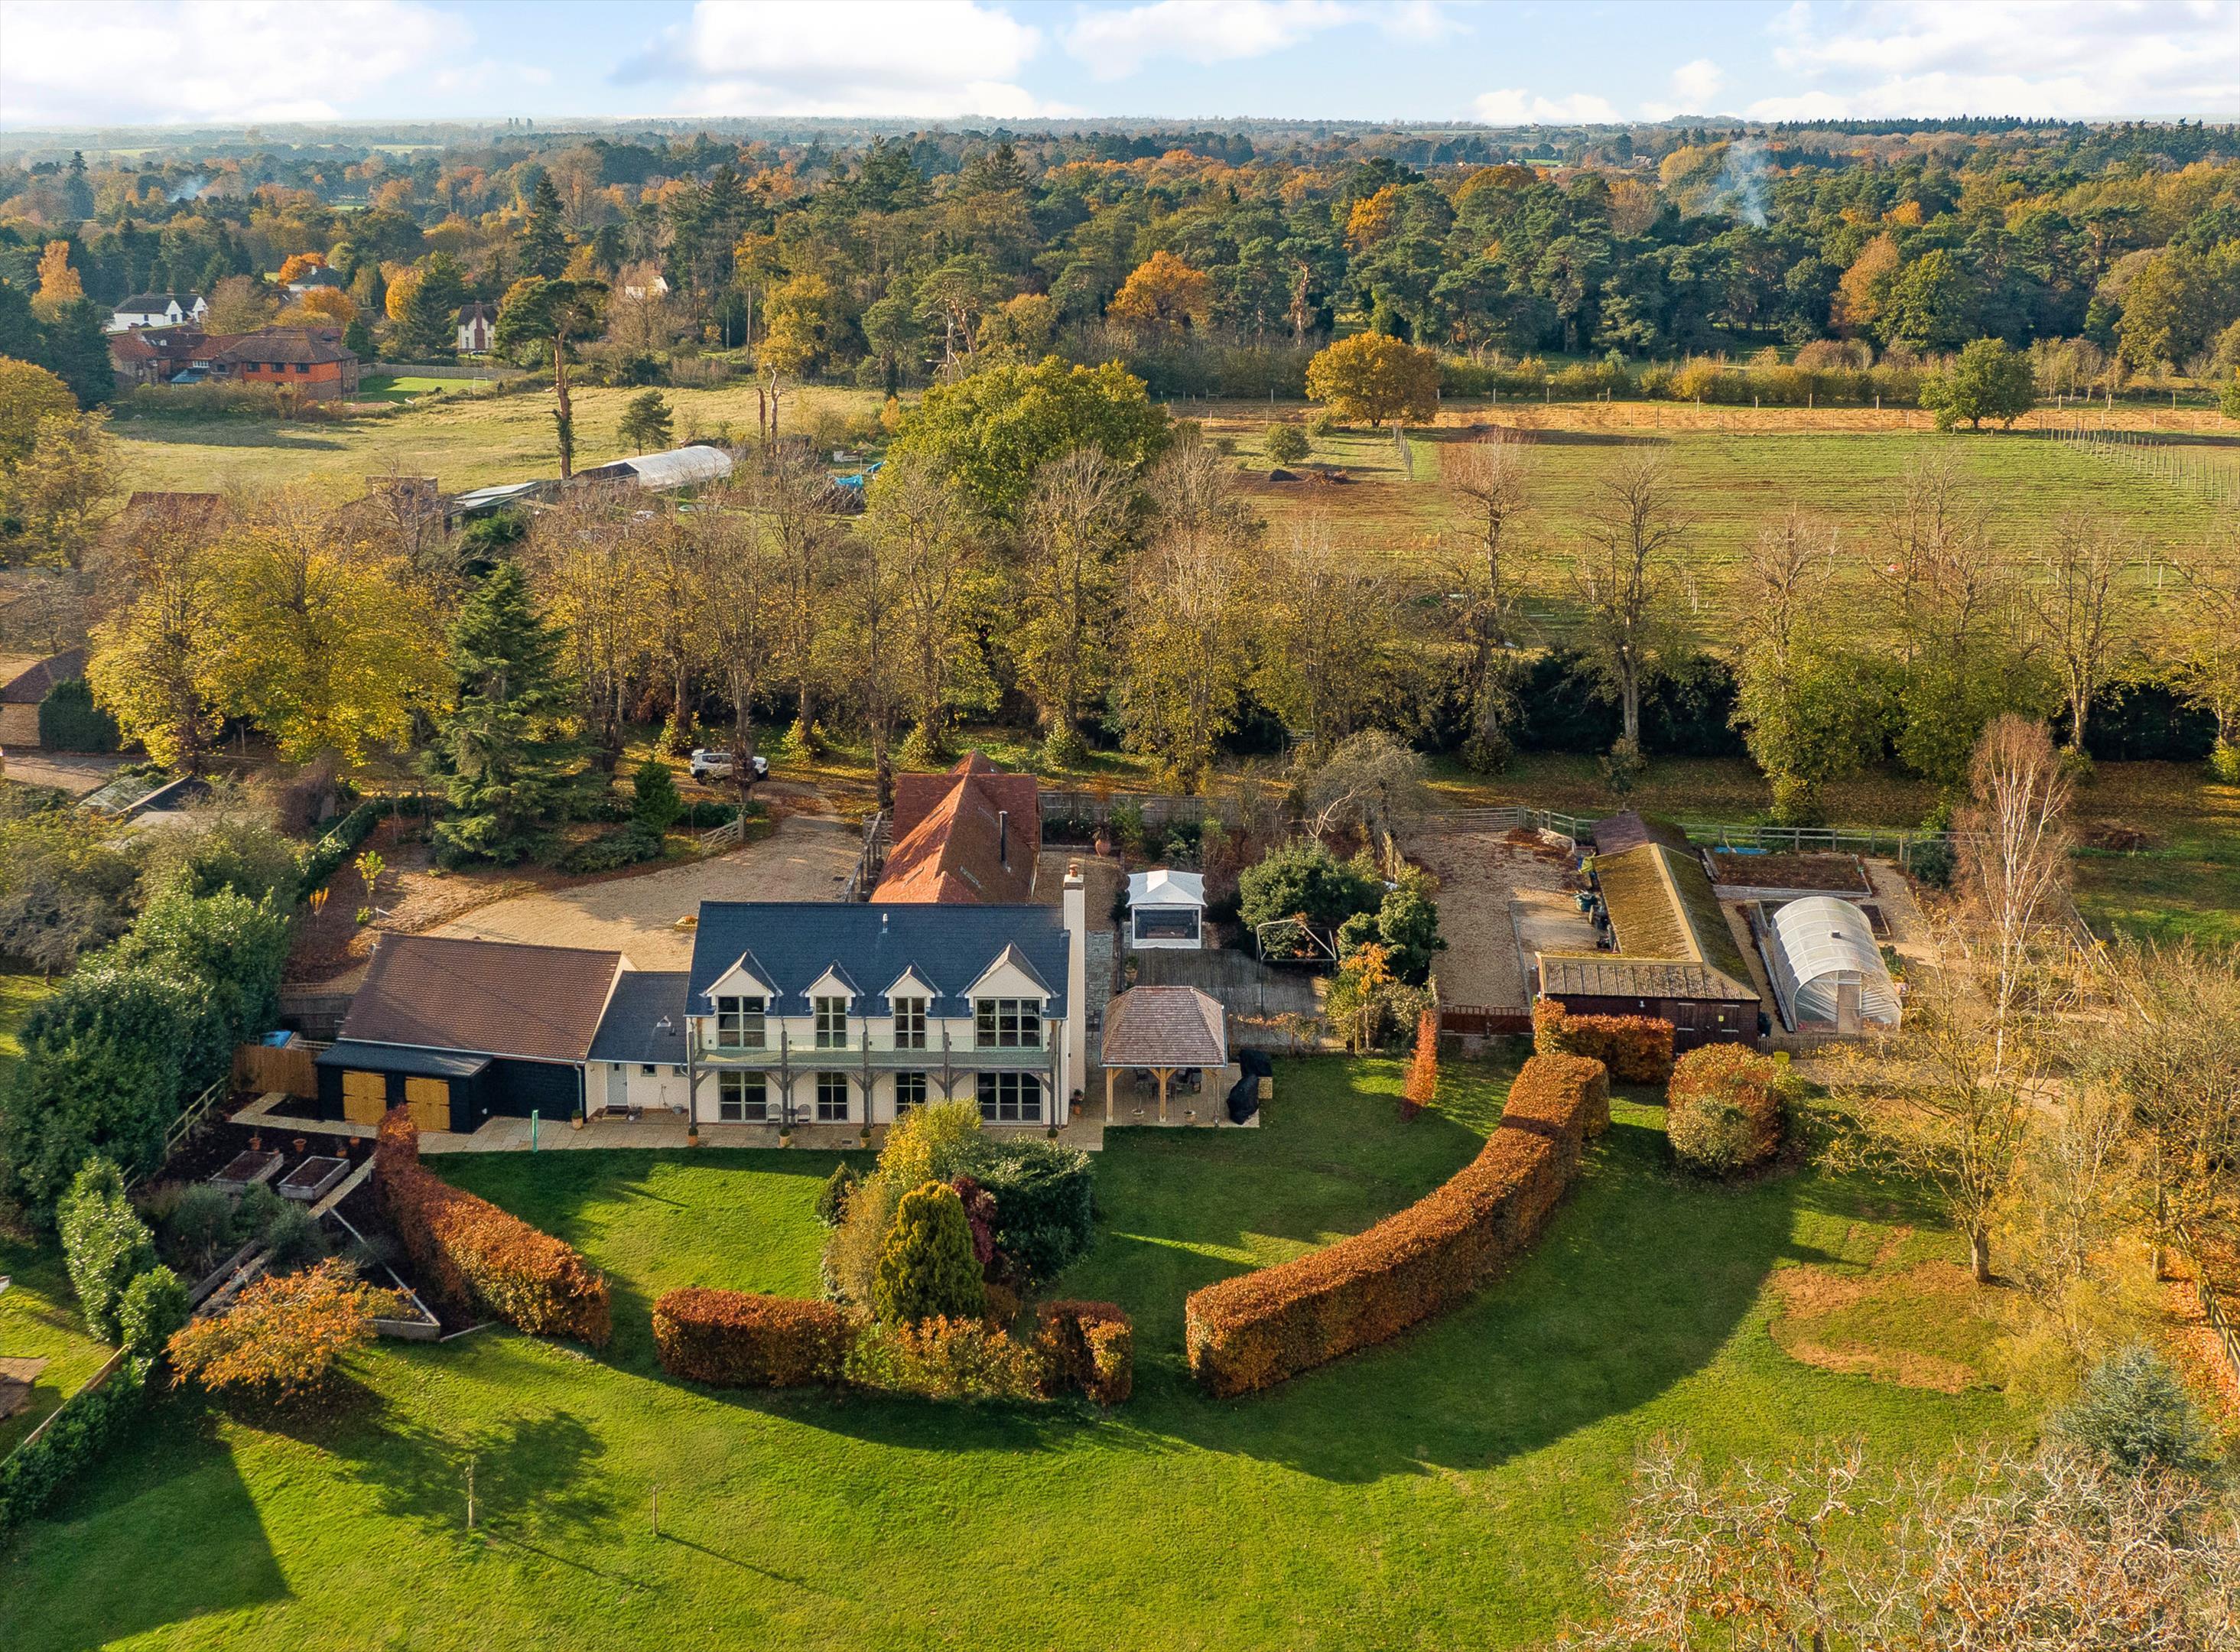 School House Frilford Heath Abingdon Oxfordshire - Aerial View